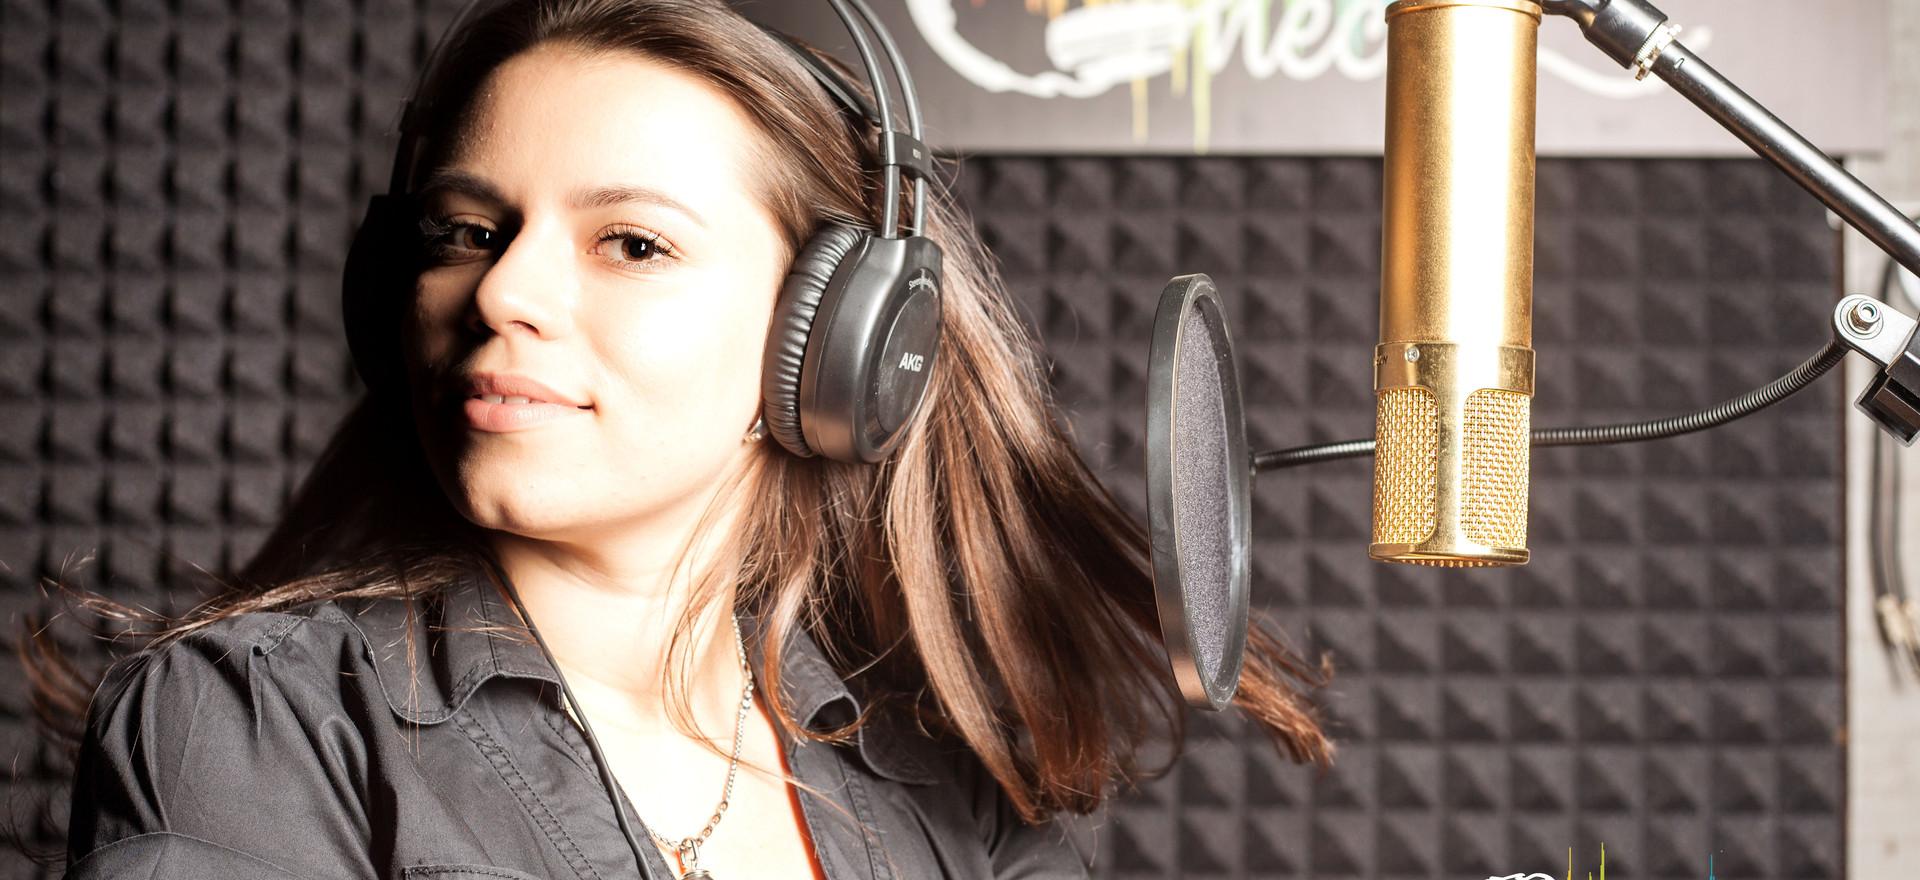 Акустическая комната студии звукозаписи CheckRecords